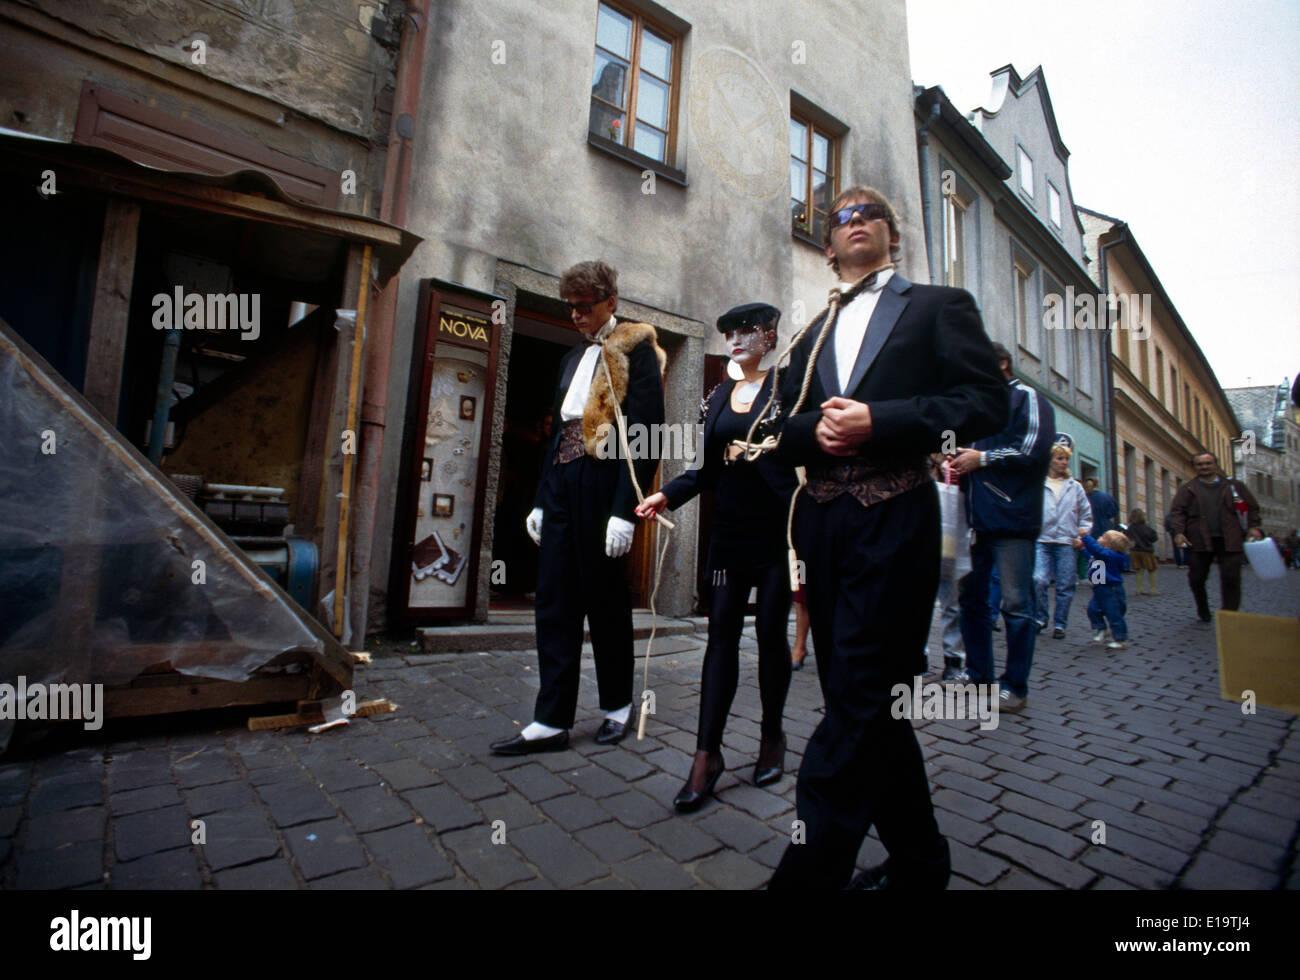 Tabor Czech Republic Street Mime Artistes - Stock Image